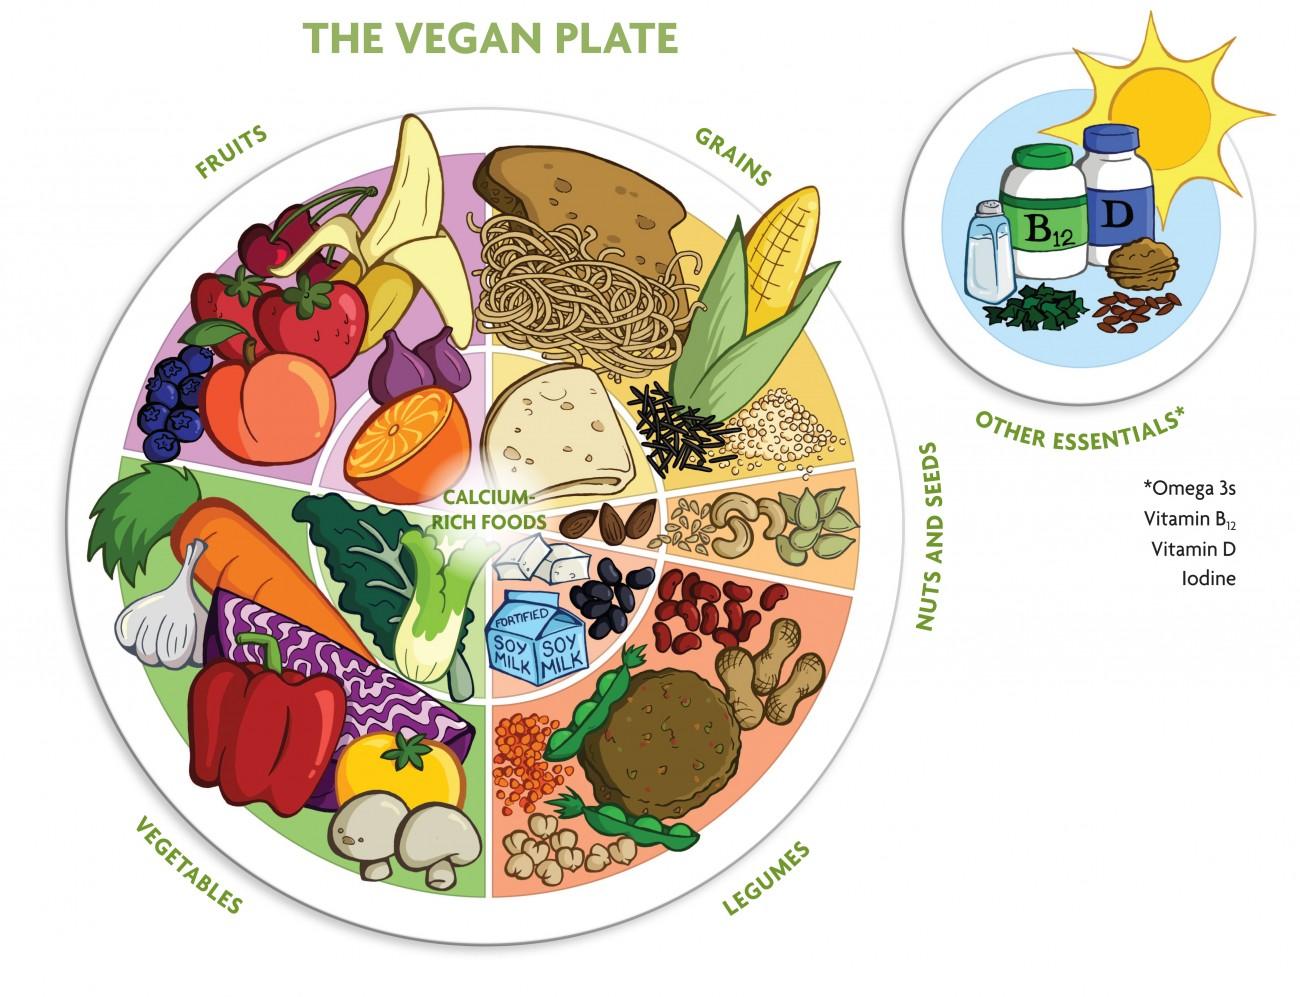 Vegan-Plate-art-BIG-hi-res-21